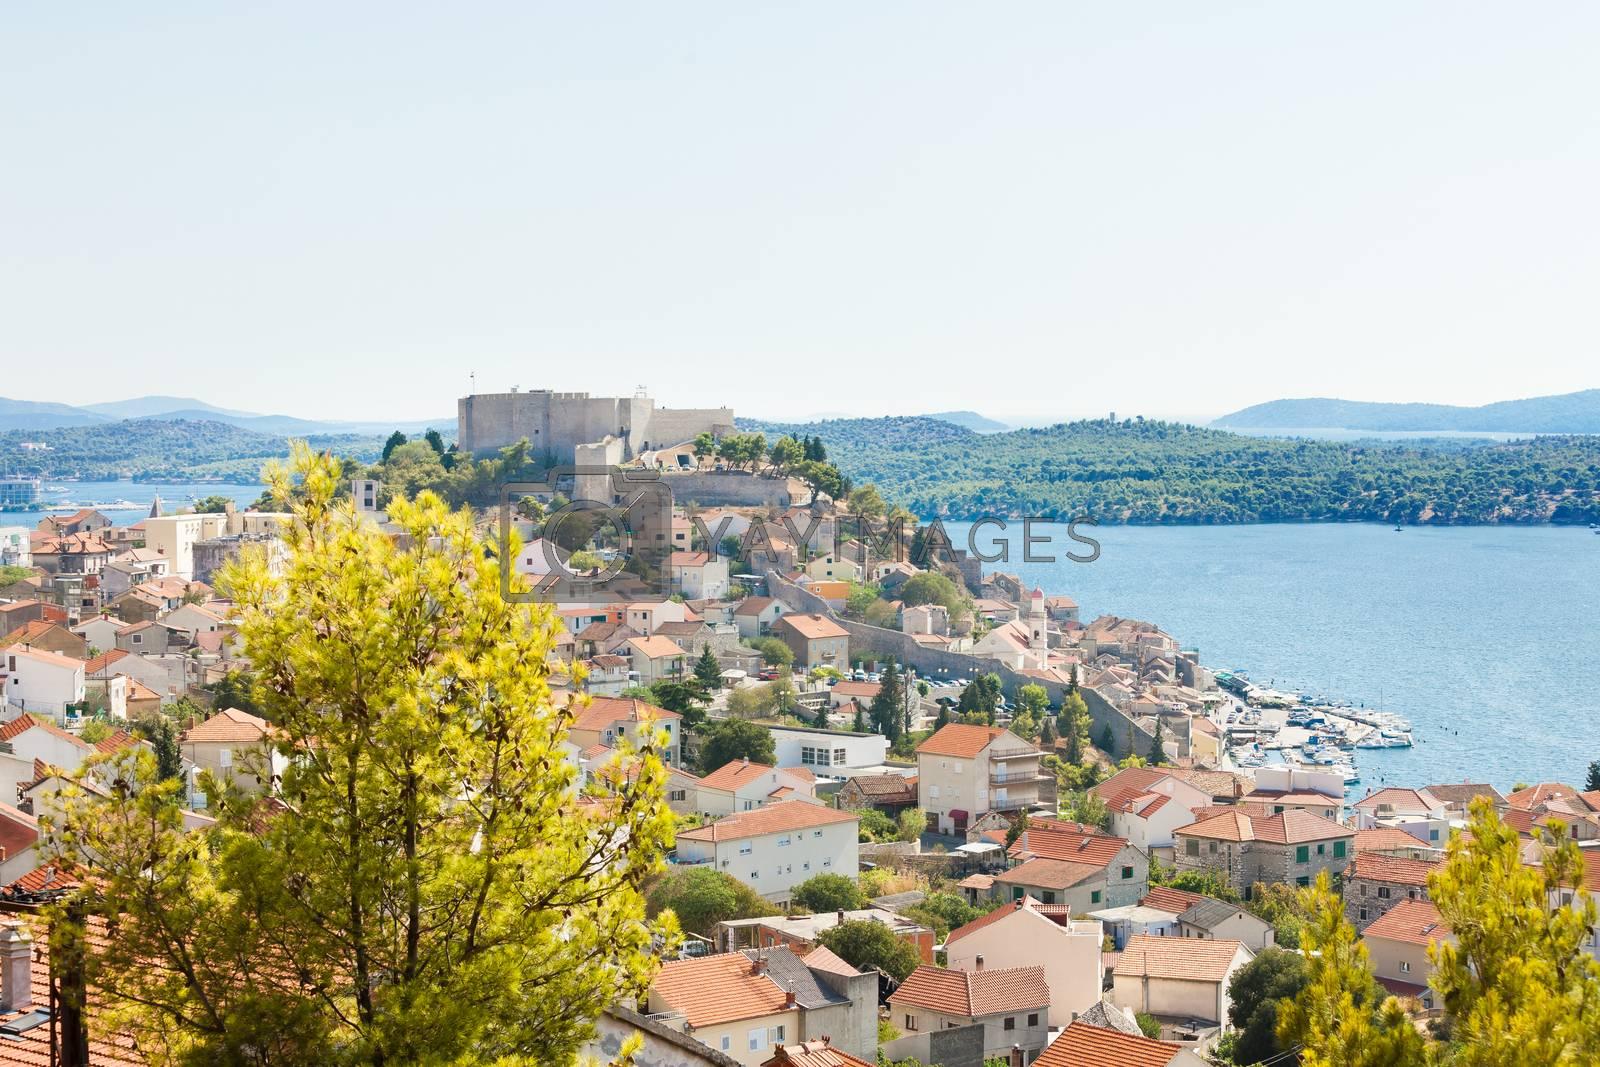 Sibenik, Croatia, Europe - Aerial view upon the old town of Sibenik